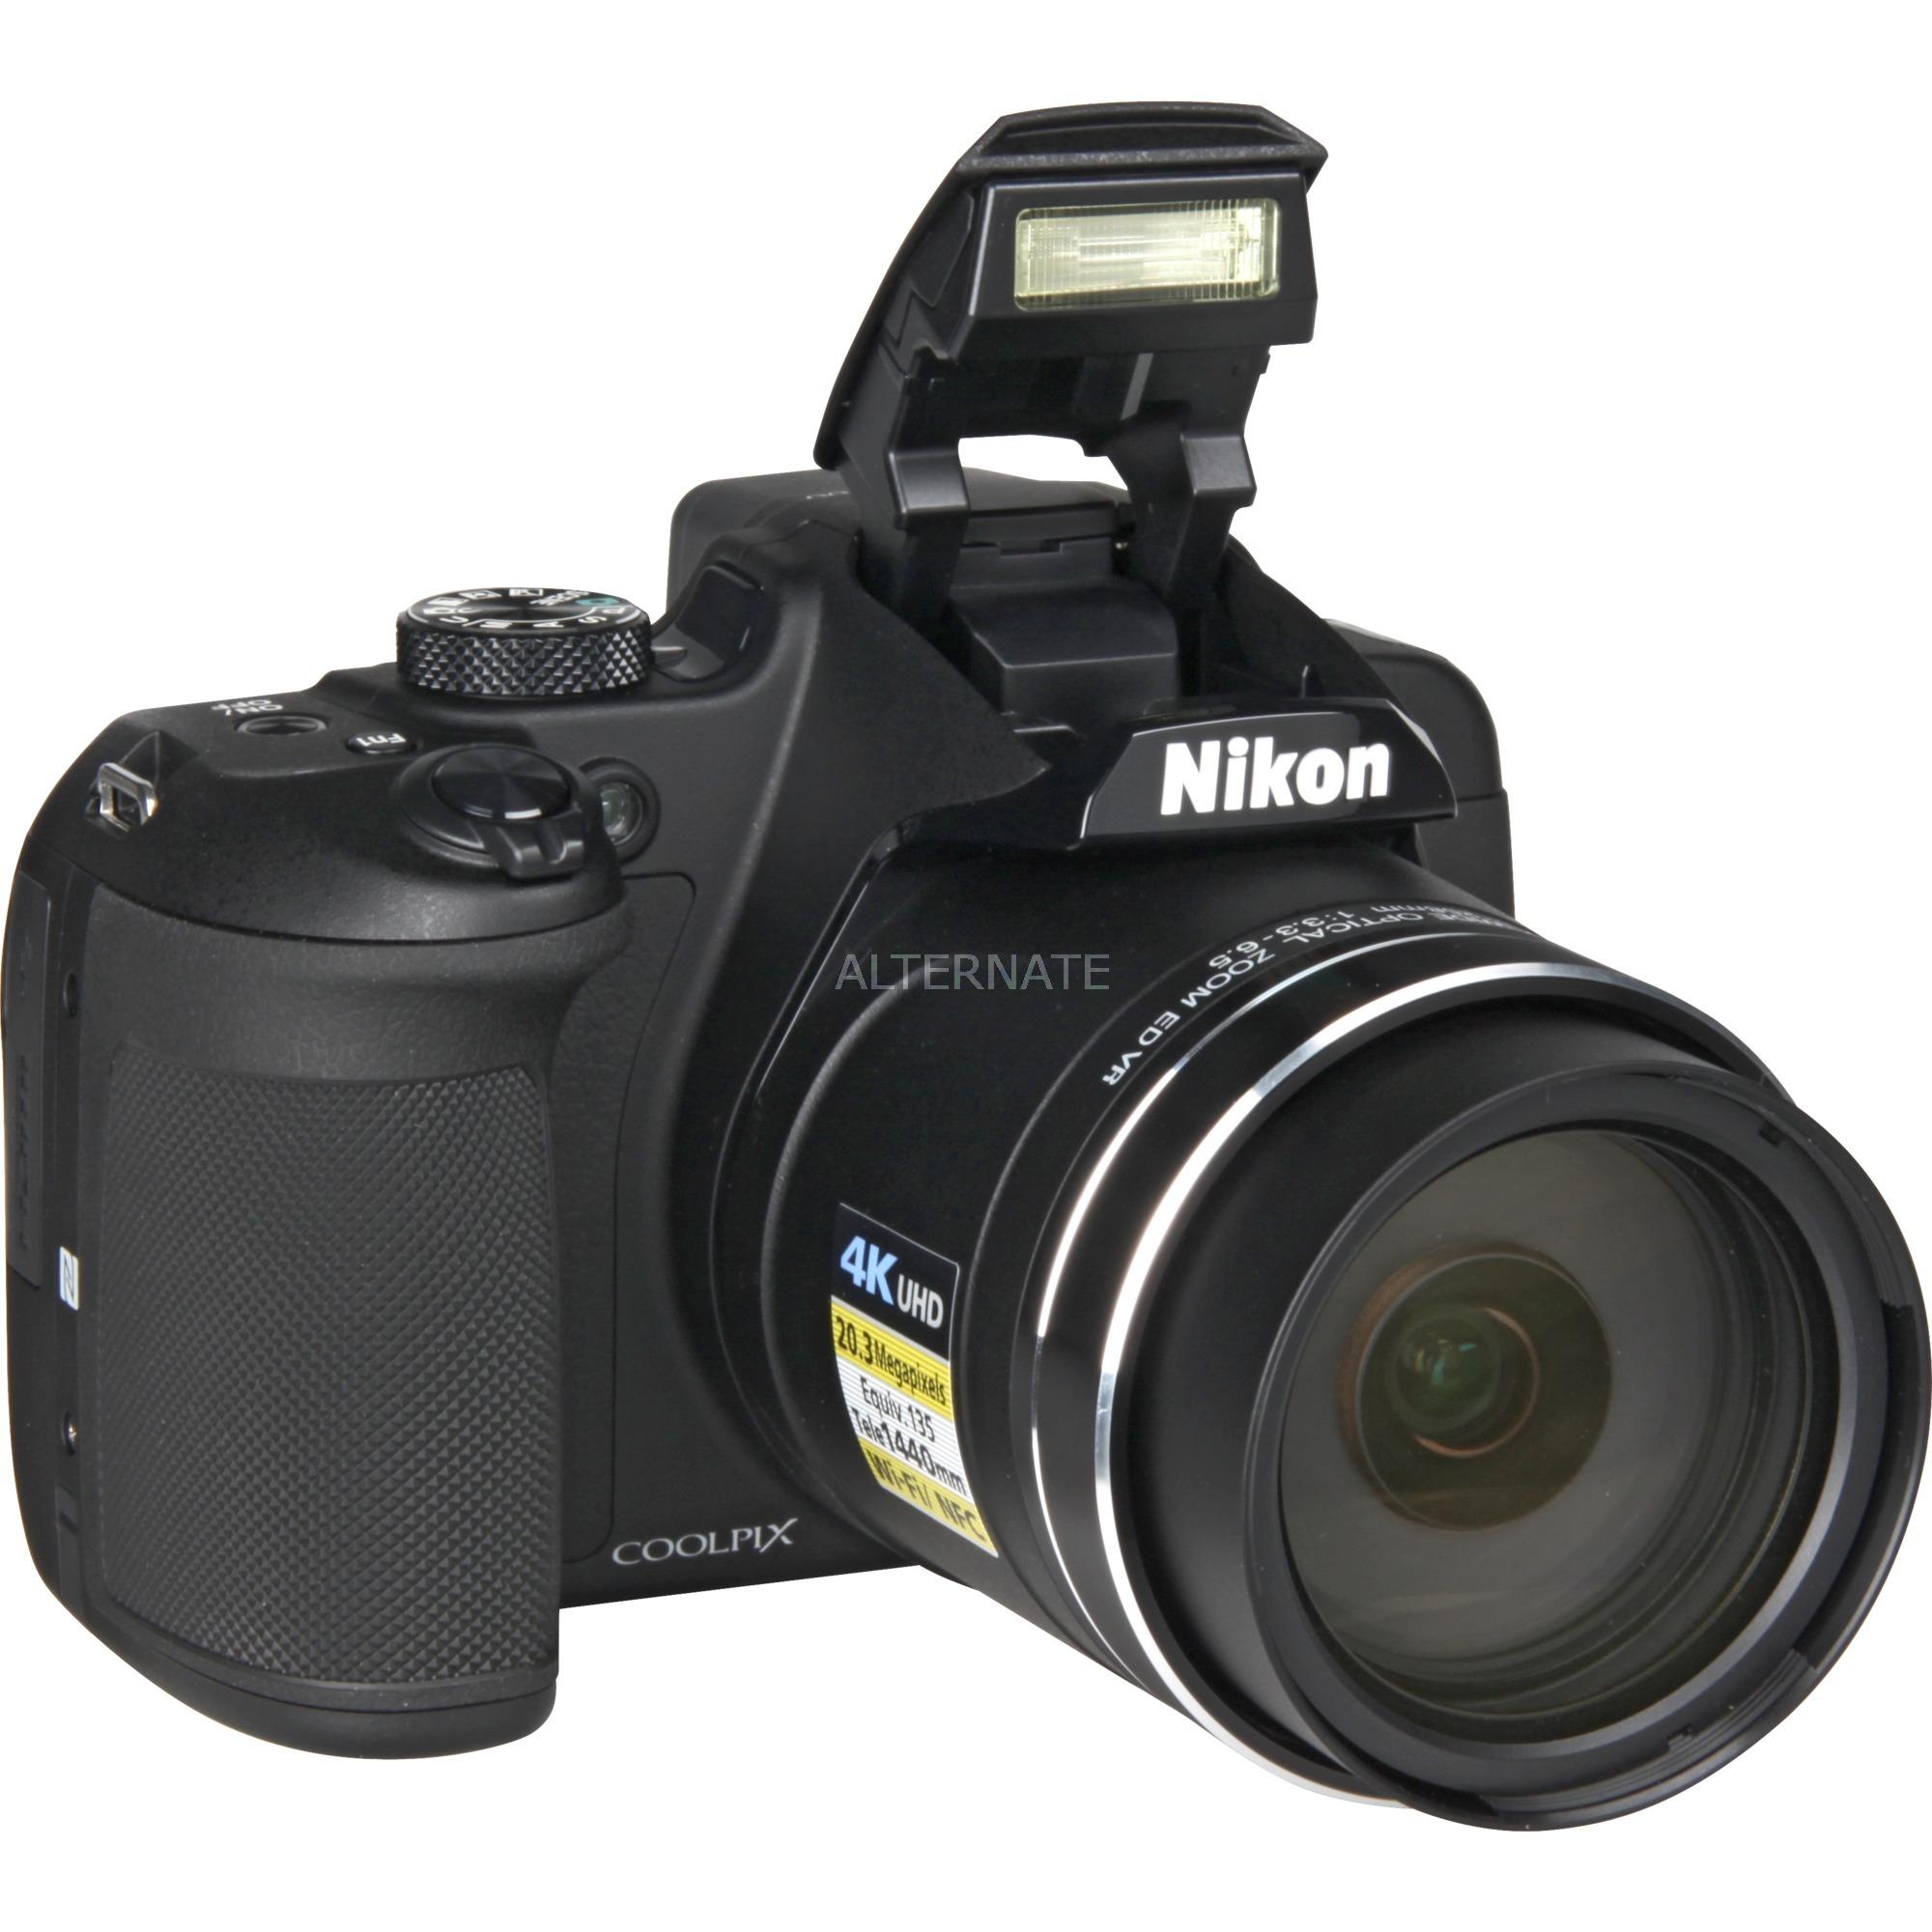 vna930e1-digital-kamera